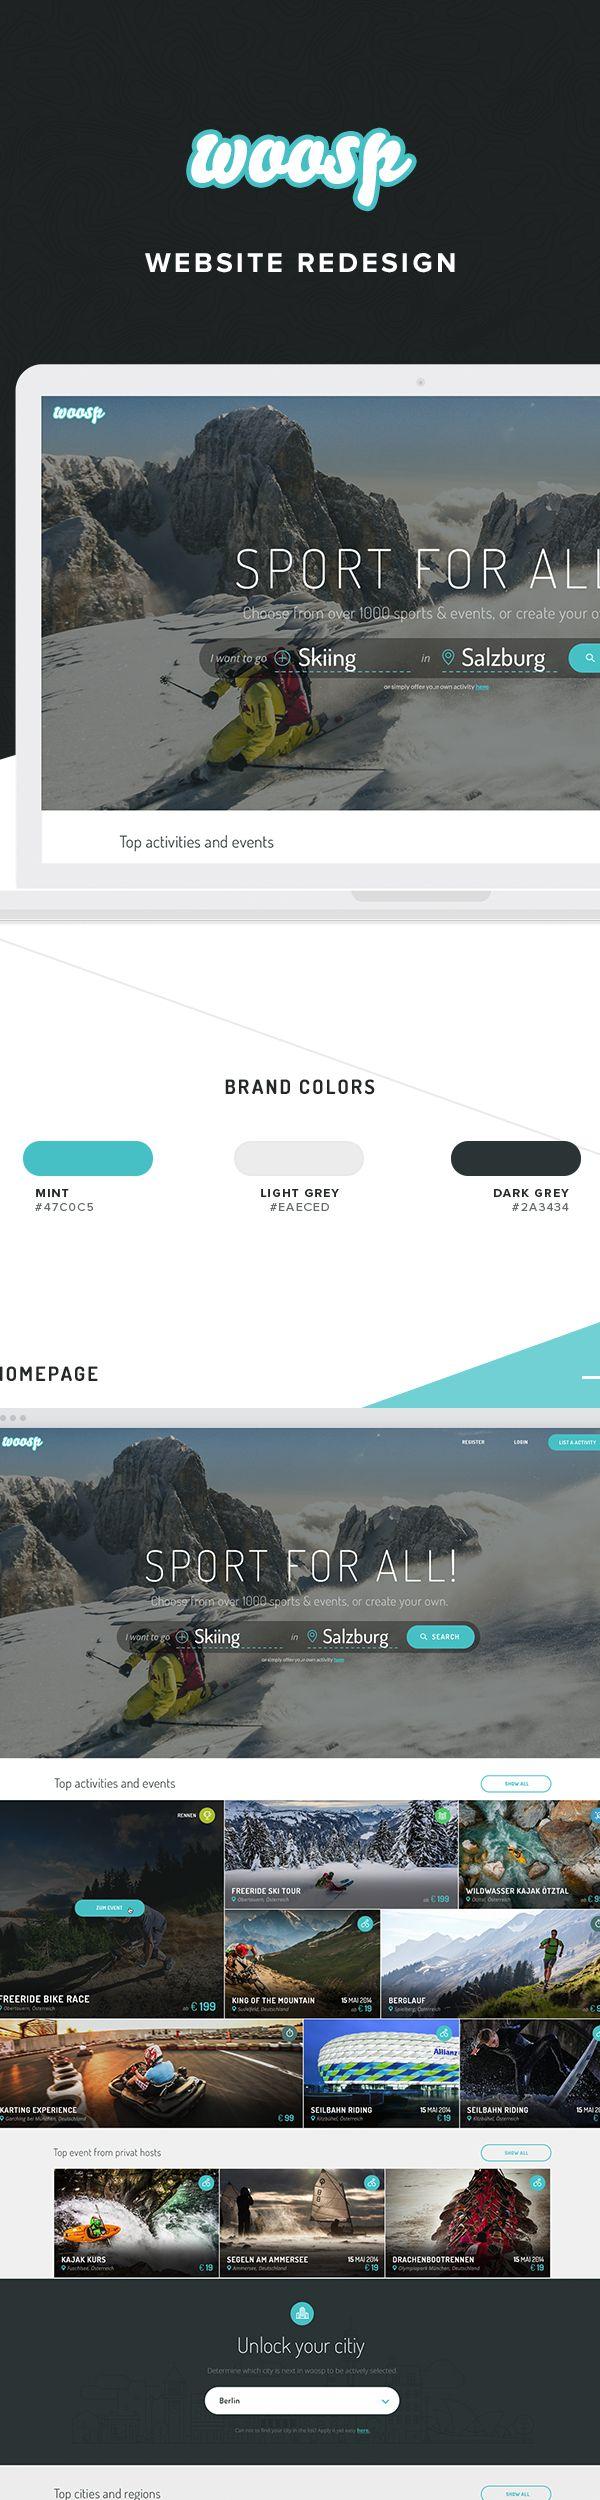 Woosp Website Redesign on Behance